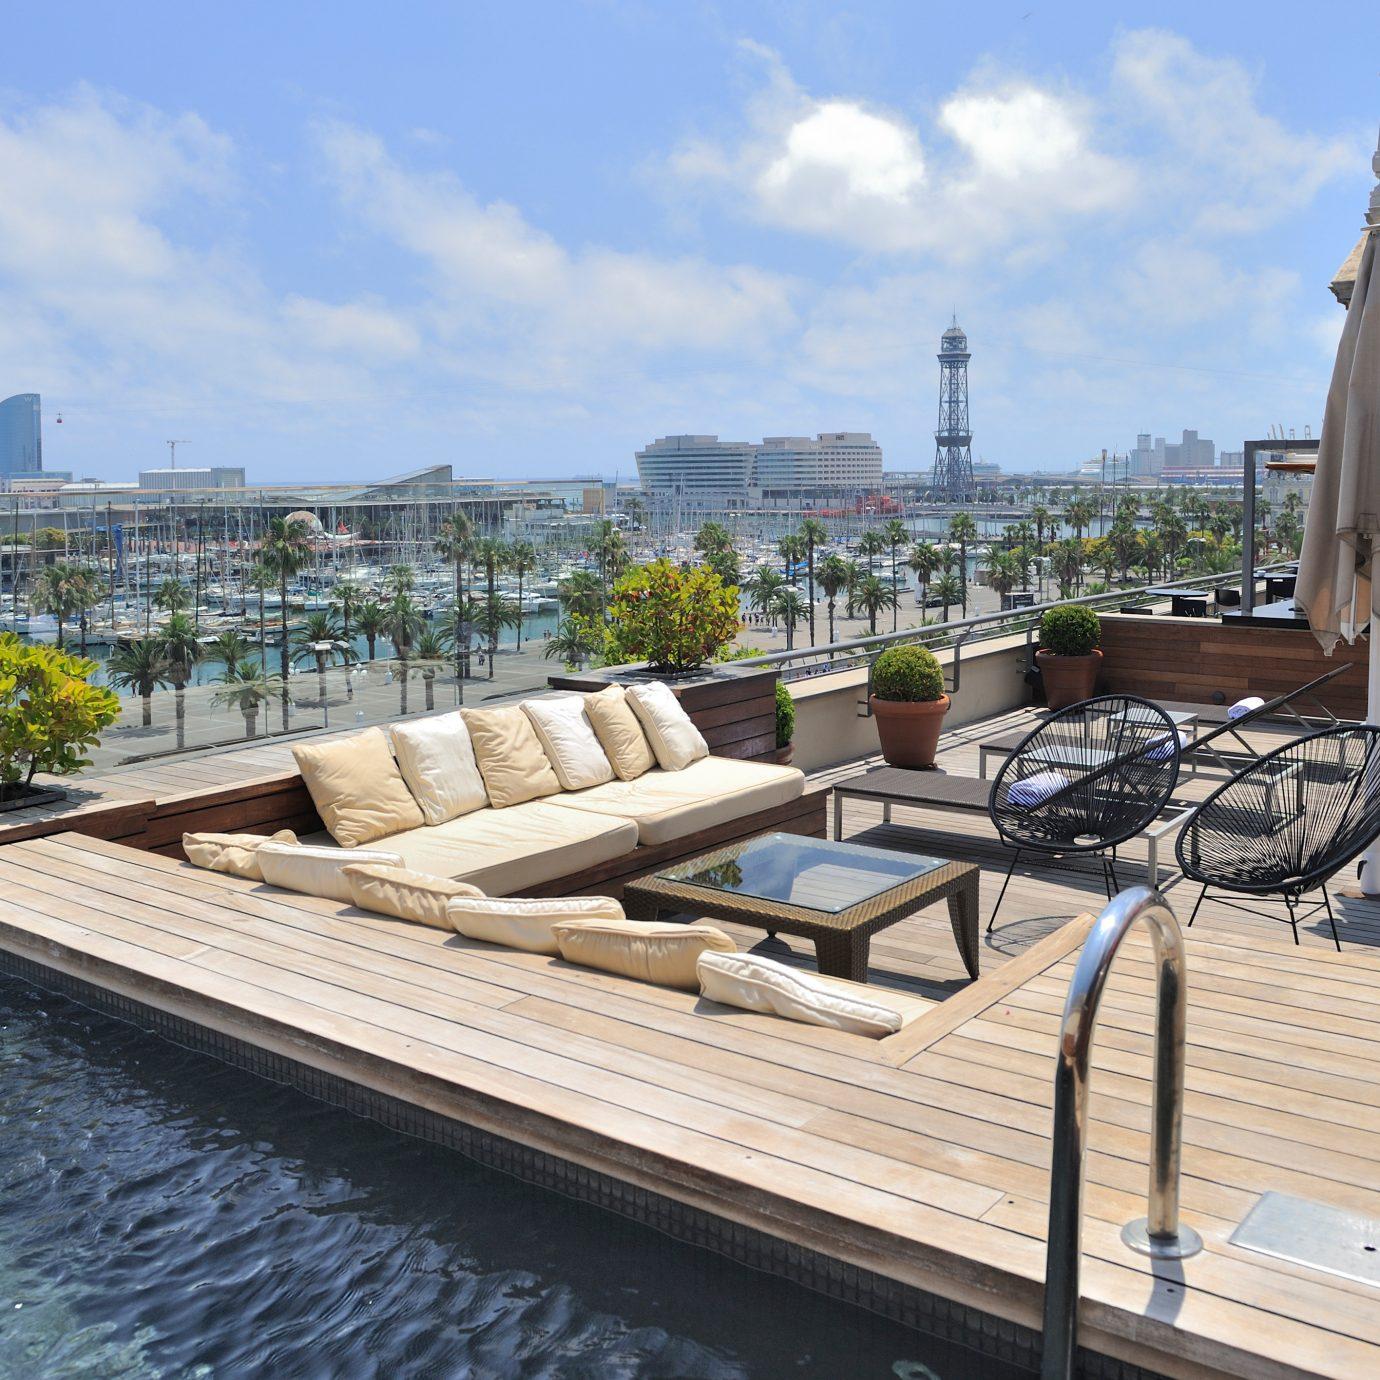 Deck Luxury Patio Pool sky property swimming pool walkway dock reflecting pool condominium waterway marina outdoor structure plaza